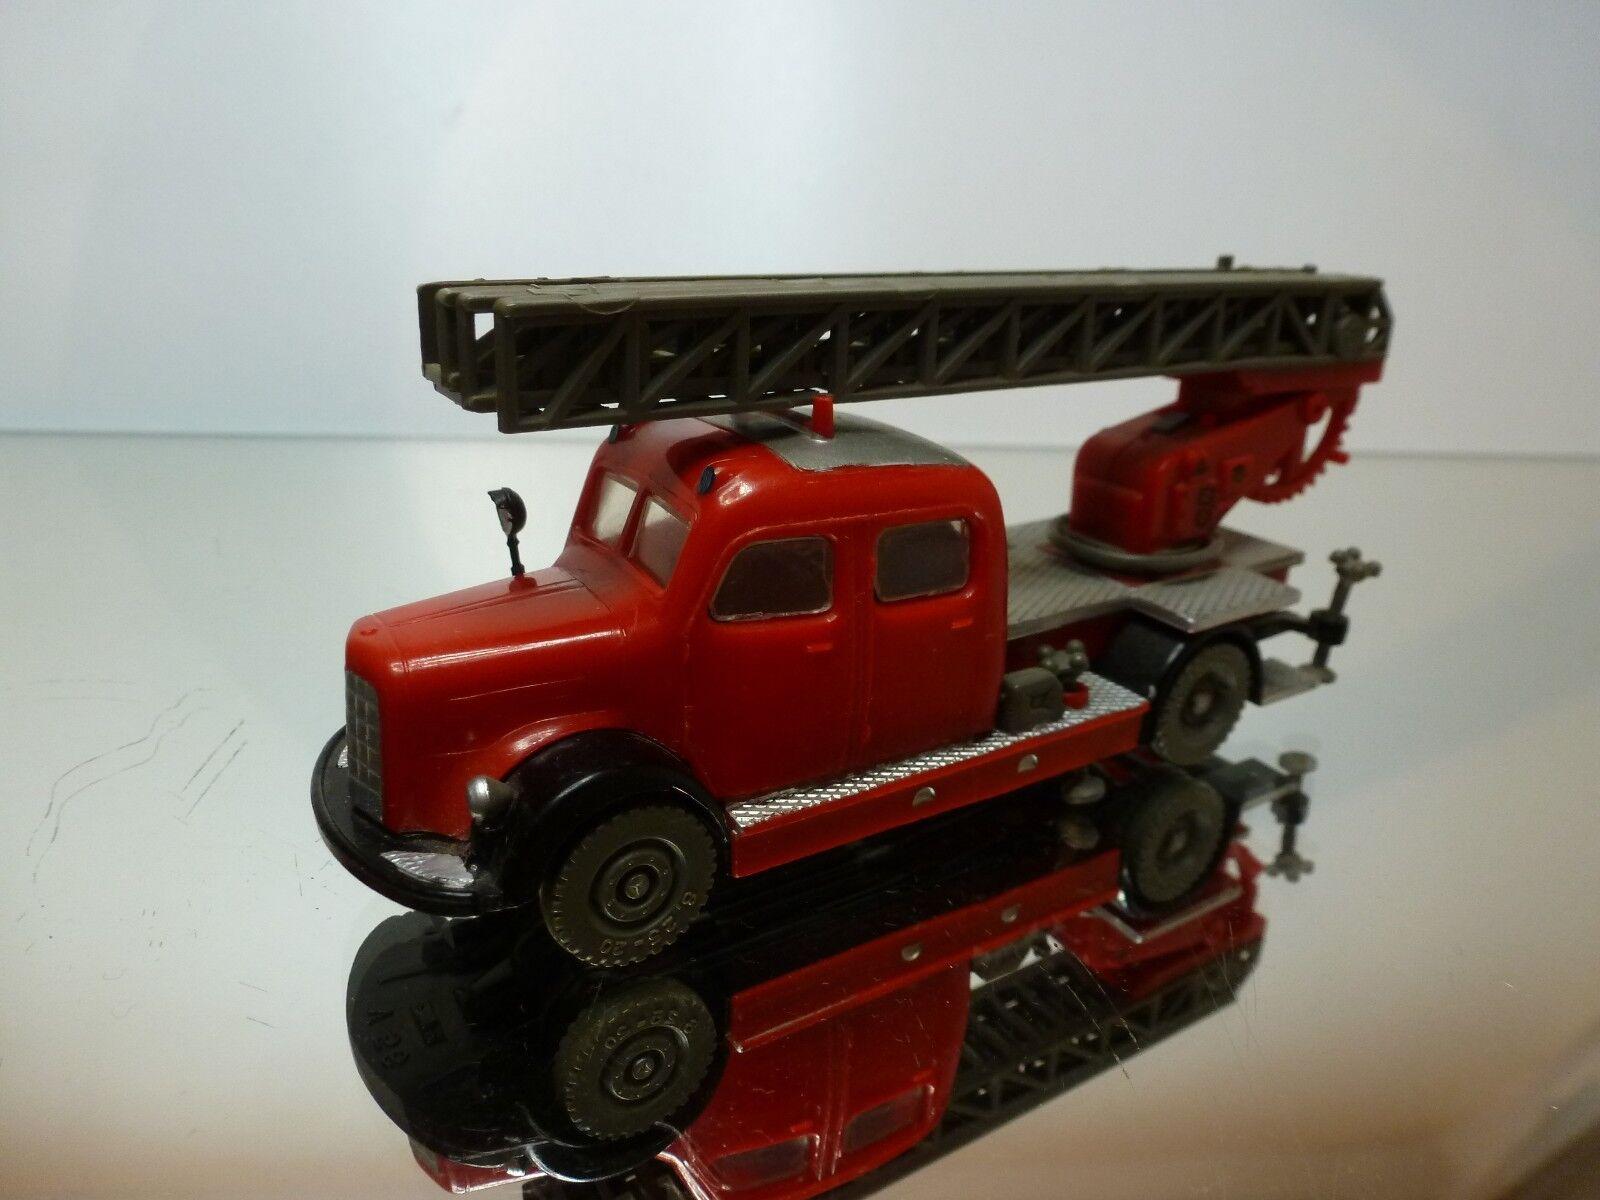 SIKU V56 MERCEDES BENZ - LADDER TRUCK METZ DL22 - FIRE BRIGADE L13.0cm - GOOD